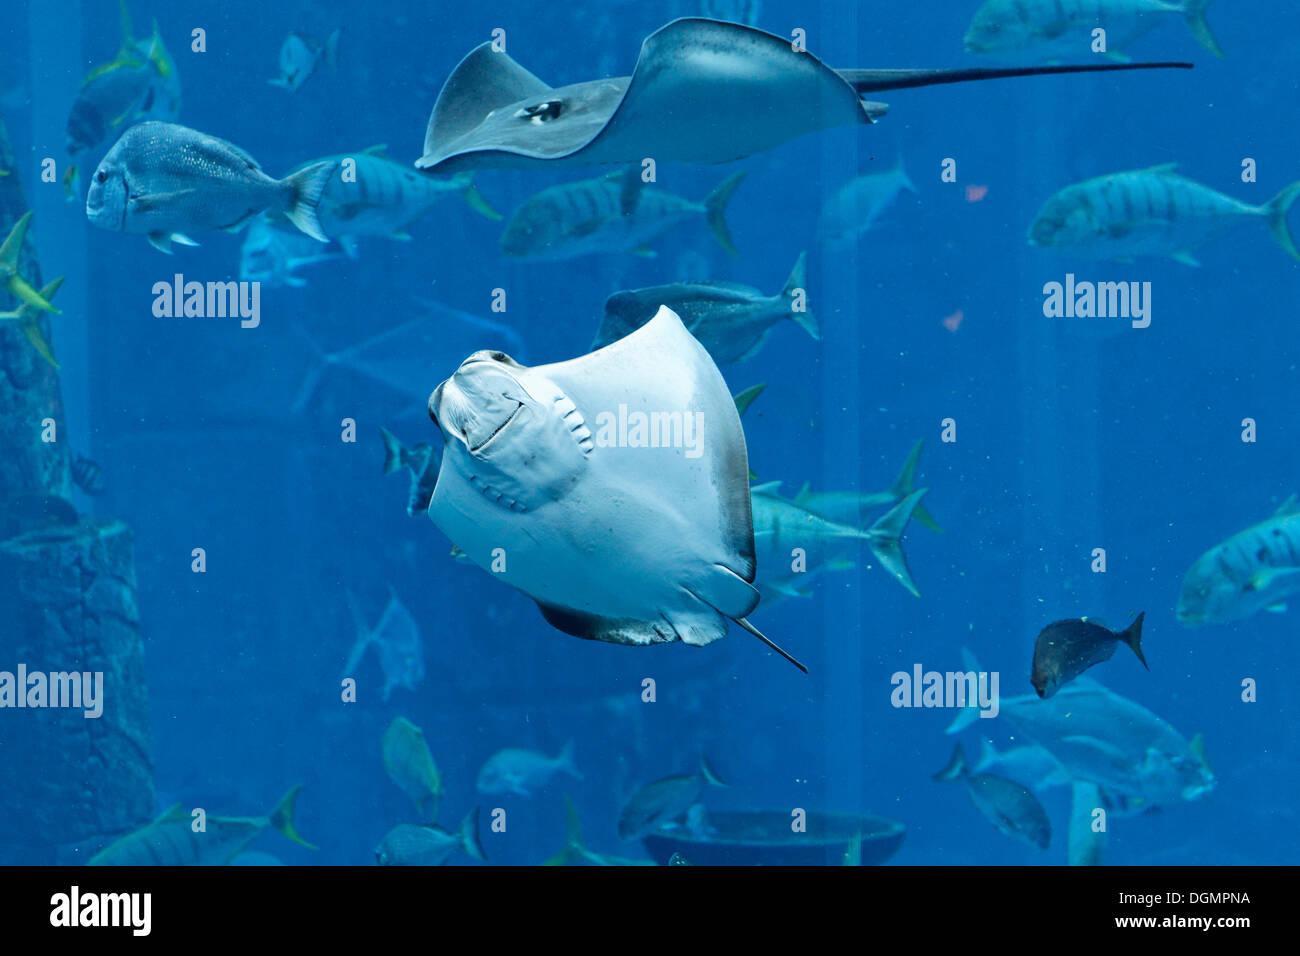 Stingrays in a gigantic aquarium, underwater world of the Ambassador Lagoon, Atlantis Hotel, The Palm Jumeirah, - Stock Image